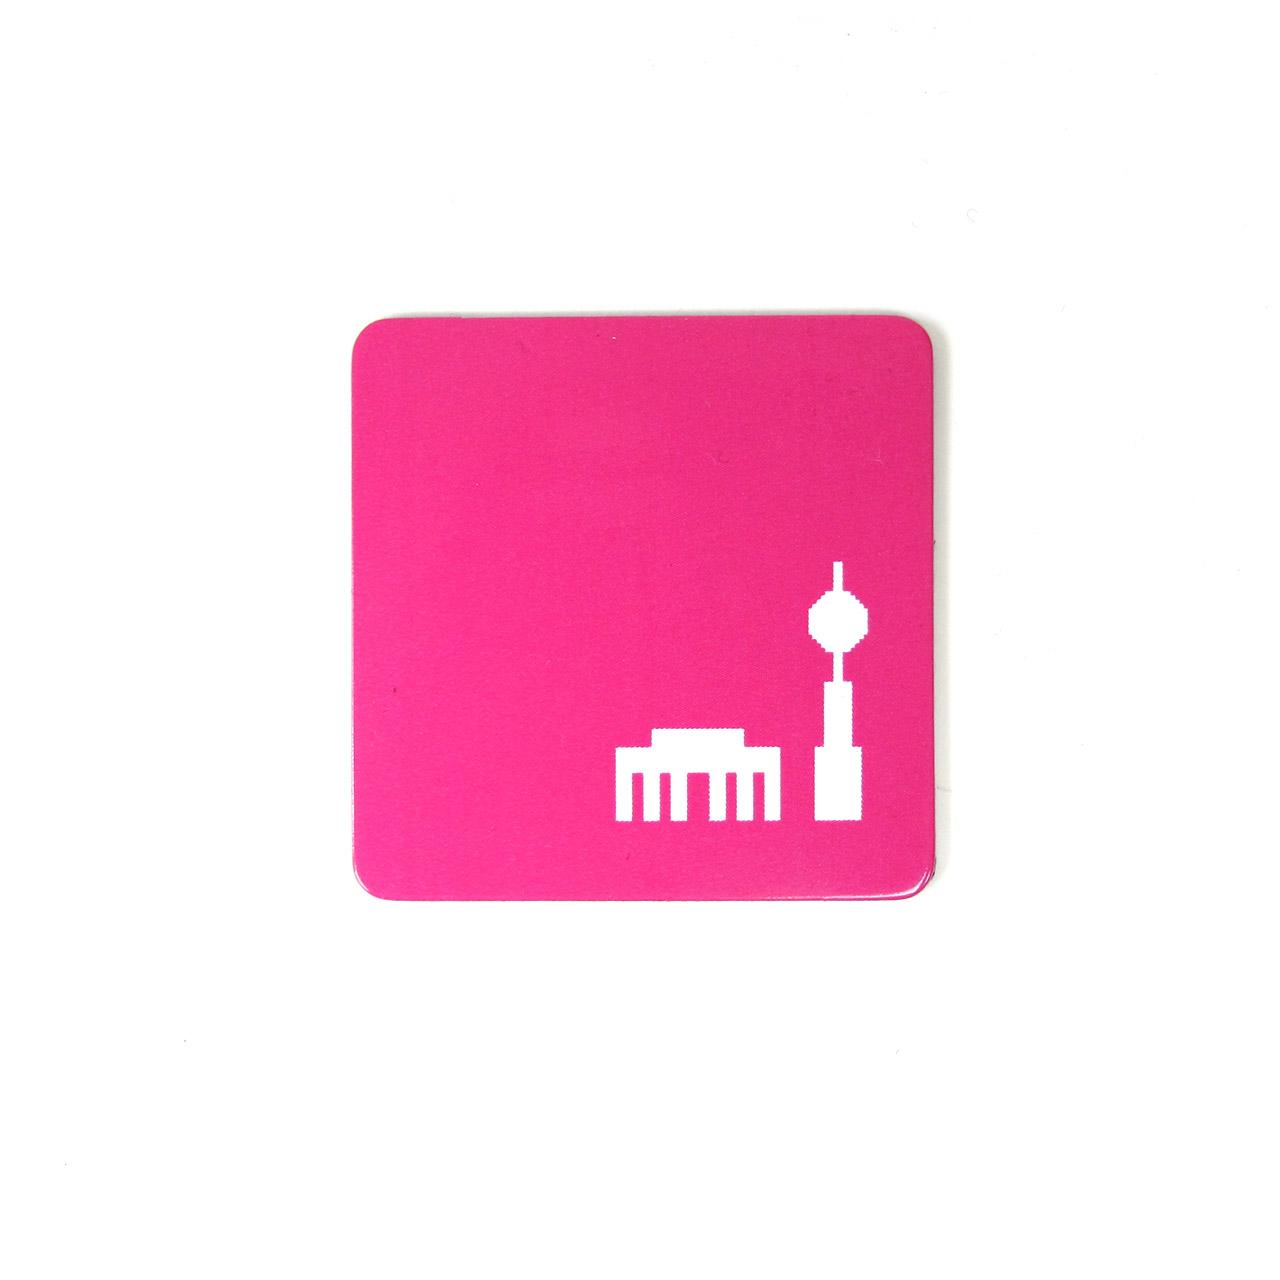 Berlinmagnet Tor + Turm pink